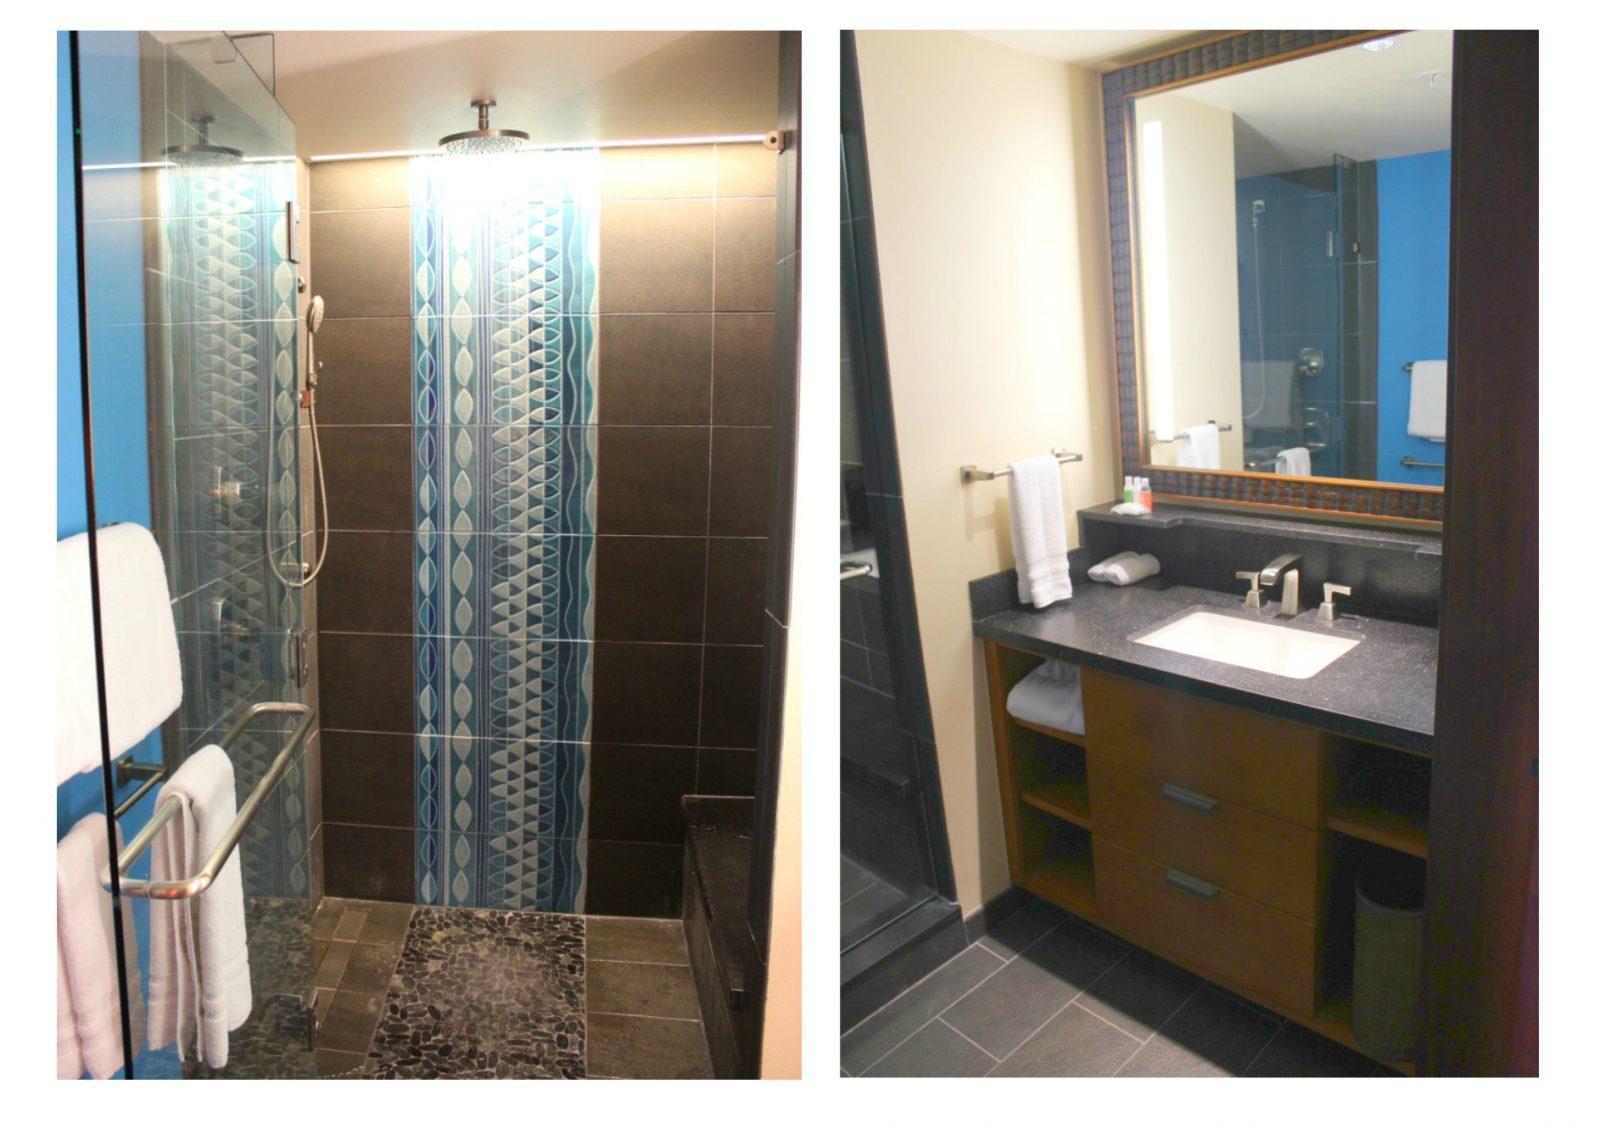 Gorgeous bathrooms at Disney's Polynesian Resort